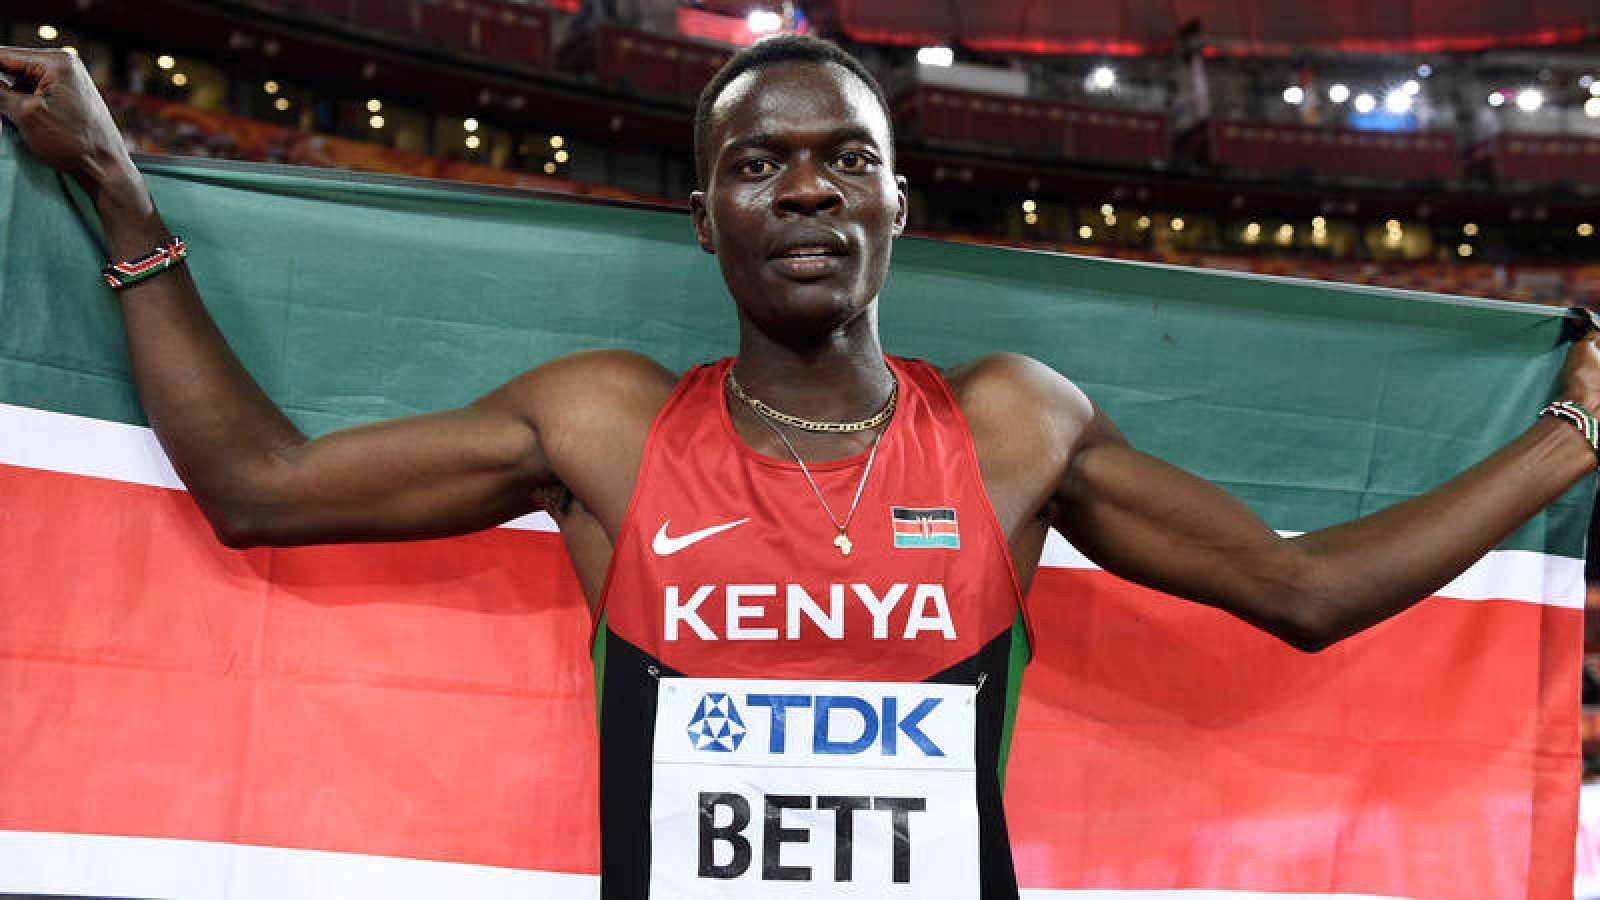 Imagen de archivo del atleta keniano Nicholas Bett.